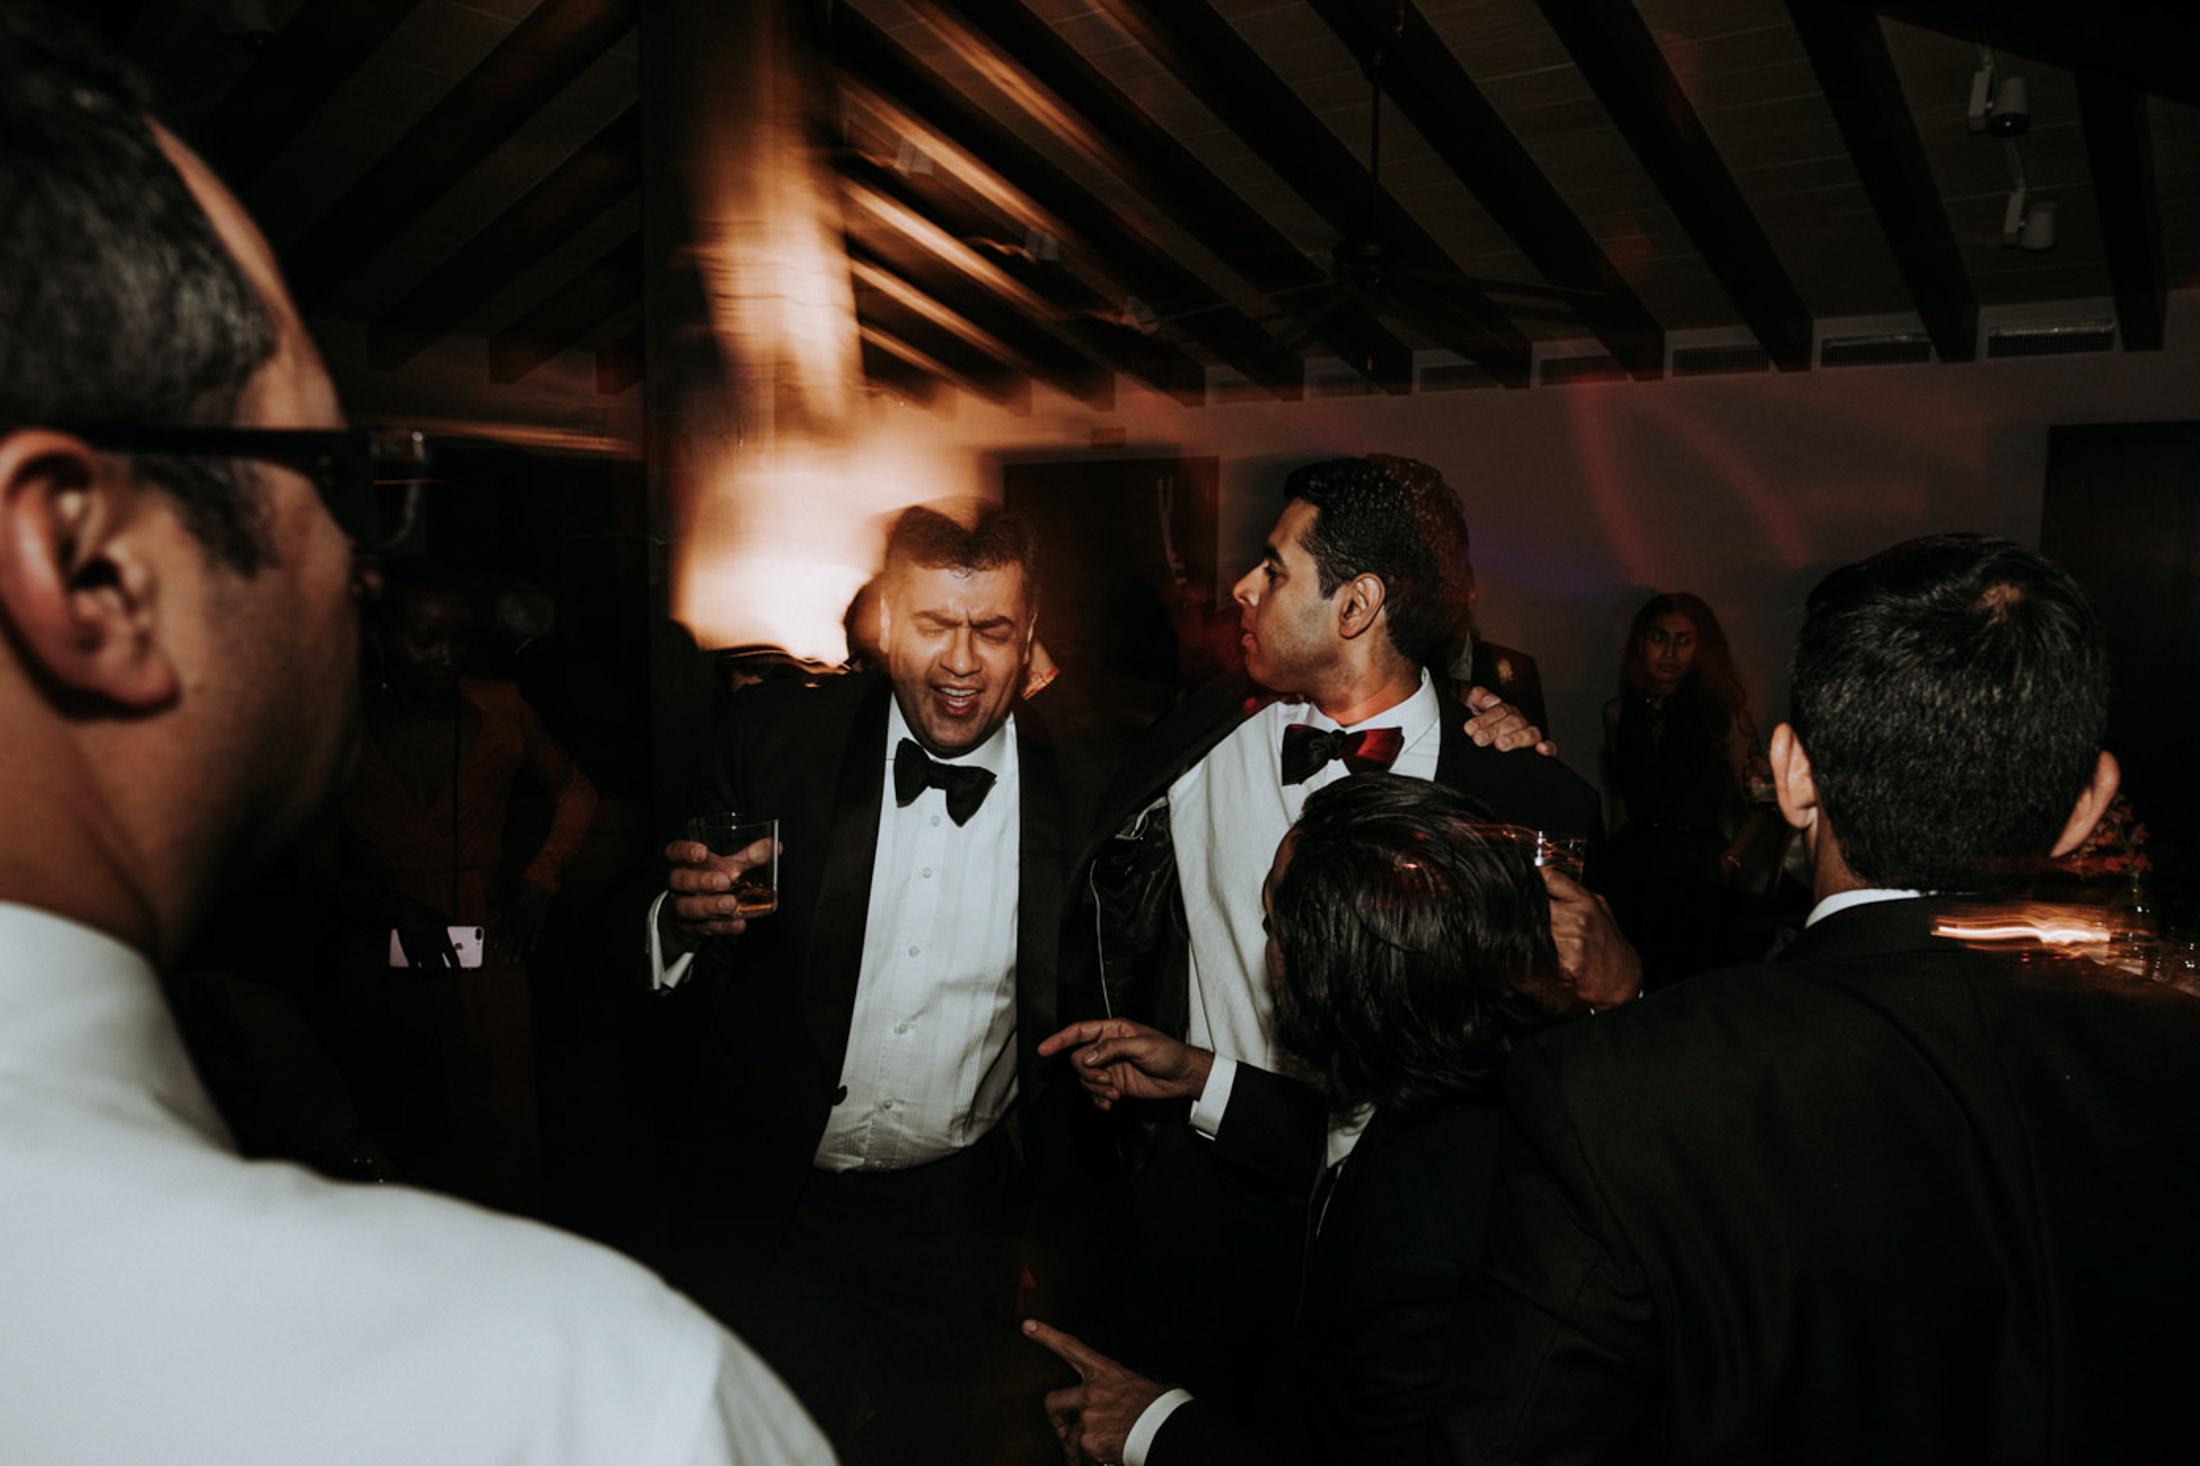 Wedding_Photographer_Mallorca_Daniela-Marquardt_Photography_New_York_Iceland_Tuscany_Santorini_Portugal_Austria_Bavaria_Elopement_Hochzeitsfotograf_AntjeRajat2_122